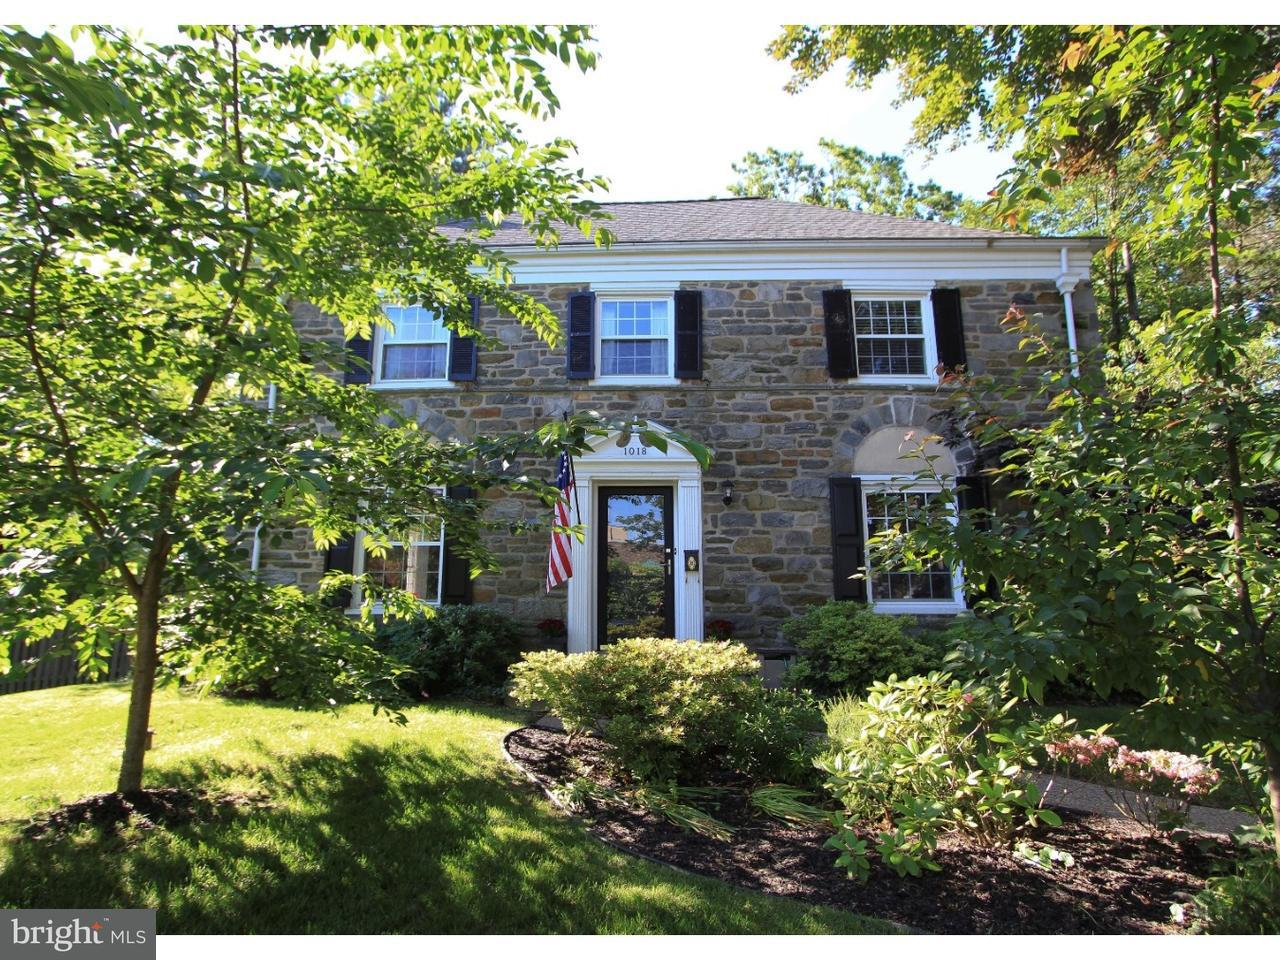 1018  Clover Hill Wynnewood , PA 19096